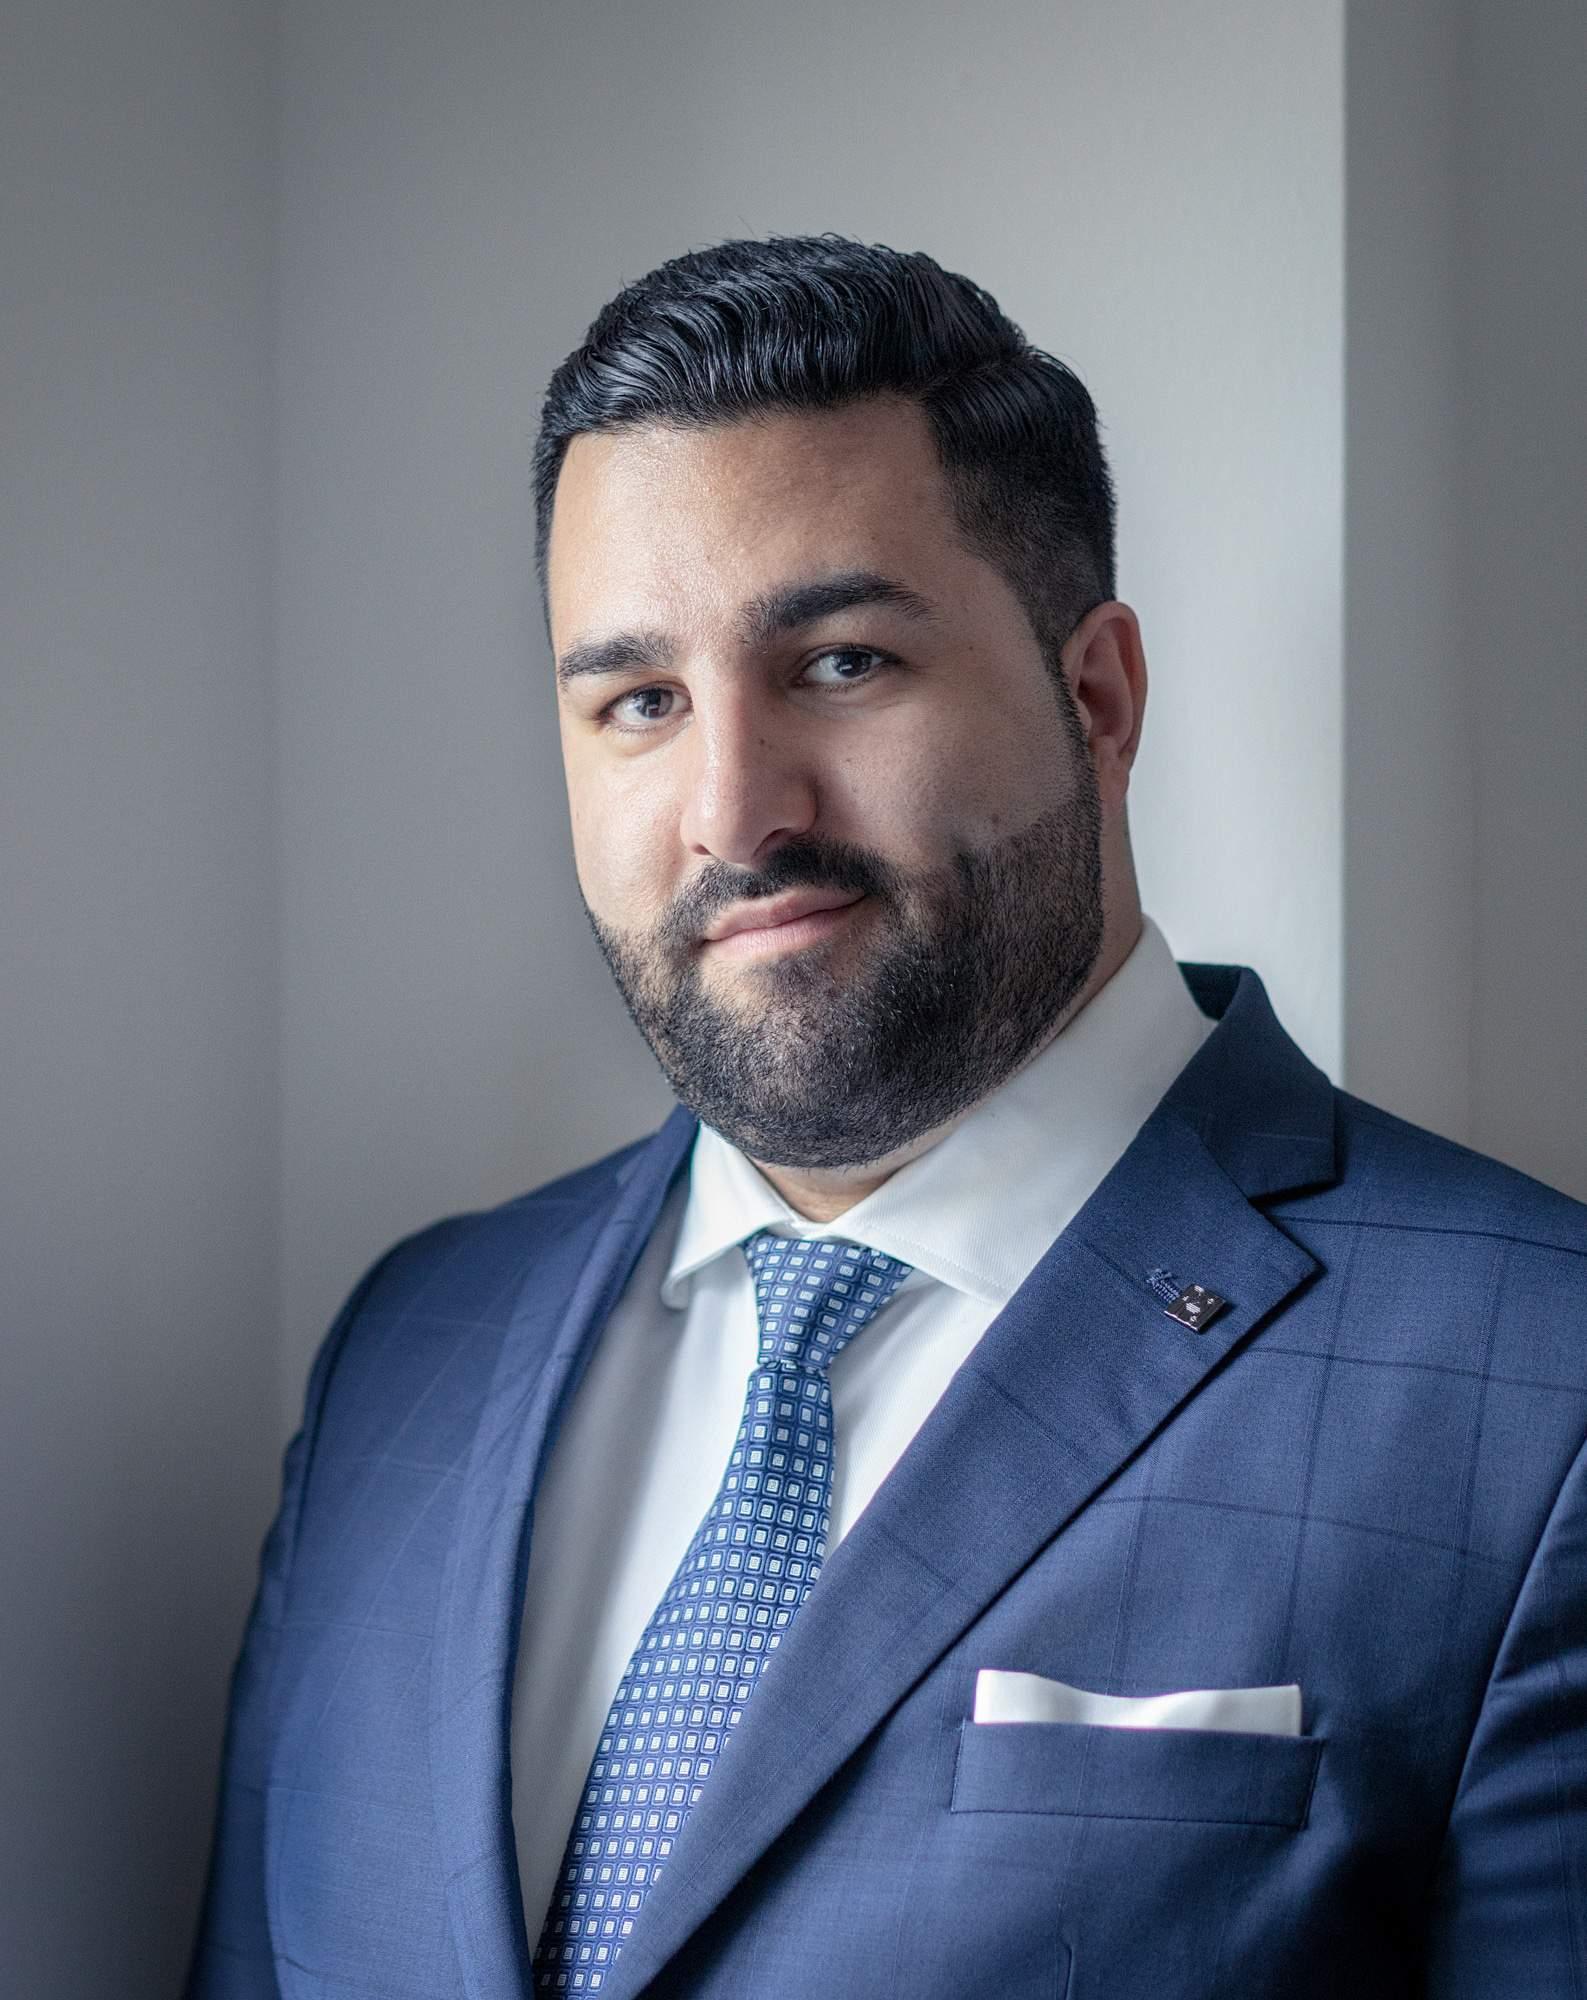 kanzlei-posikow.de - Rechtsanwalt Notash Taheri